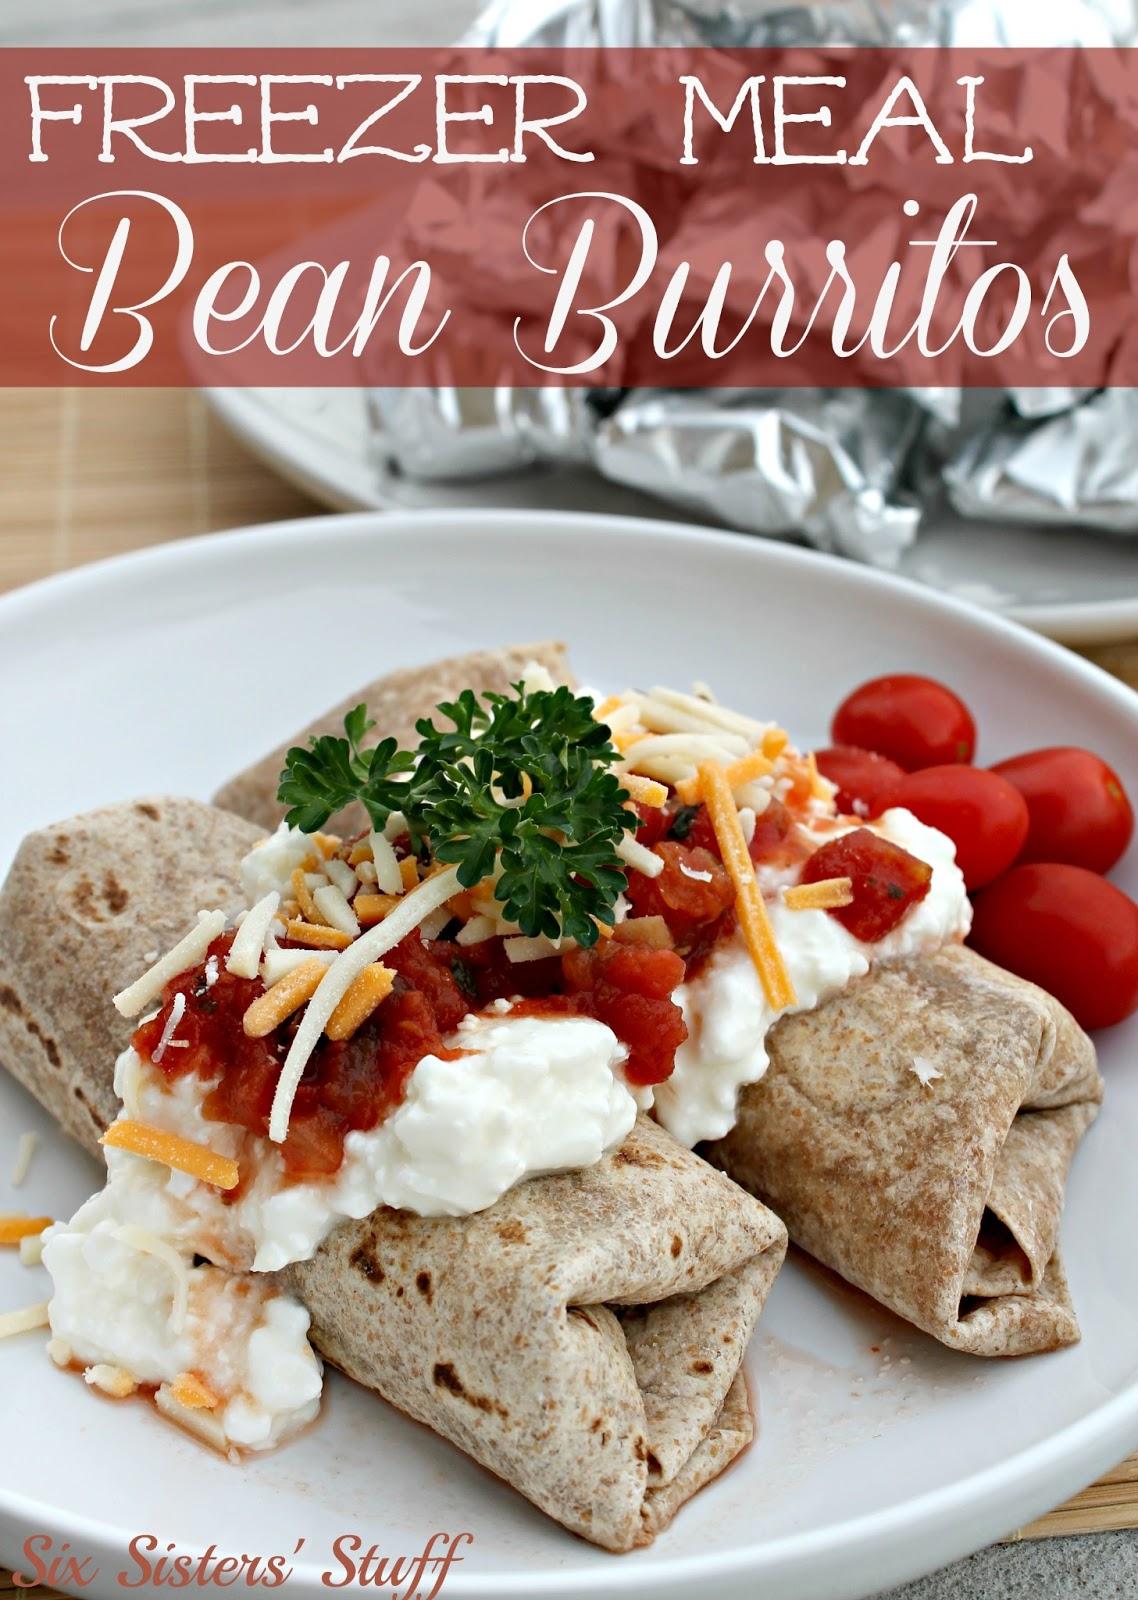 Freezer Meal Slow Cooker Bean Burritos | Six Sisters' Stuff